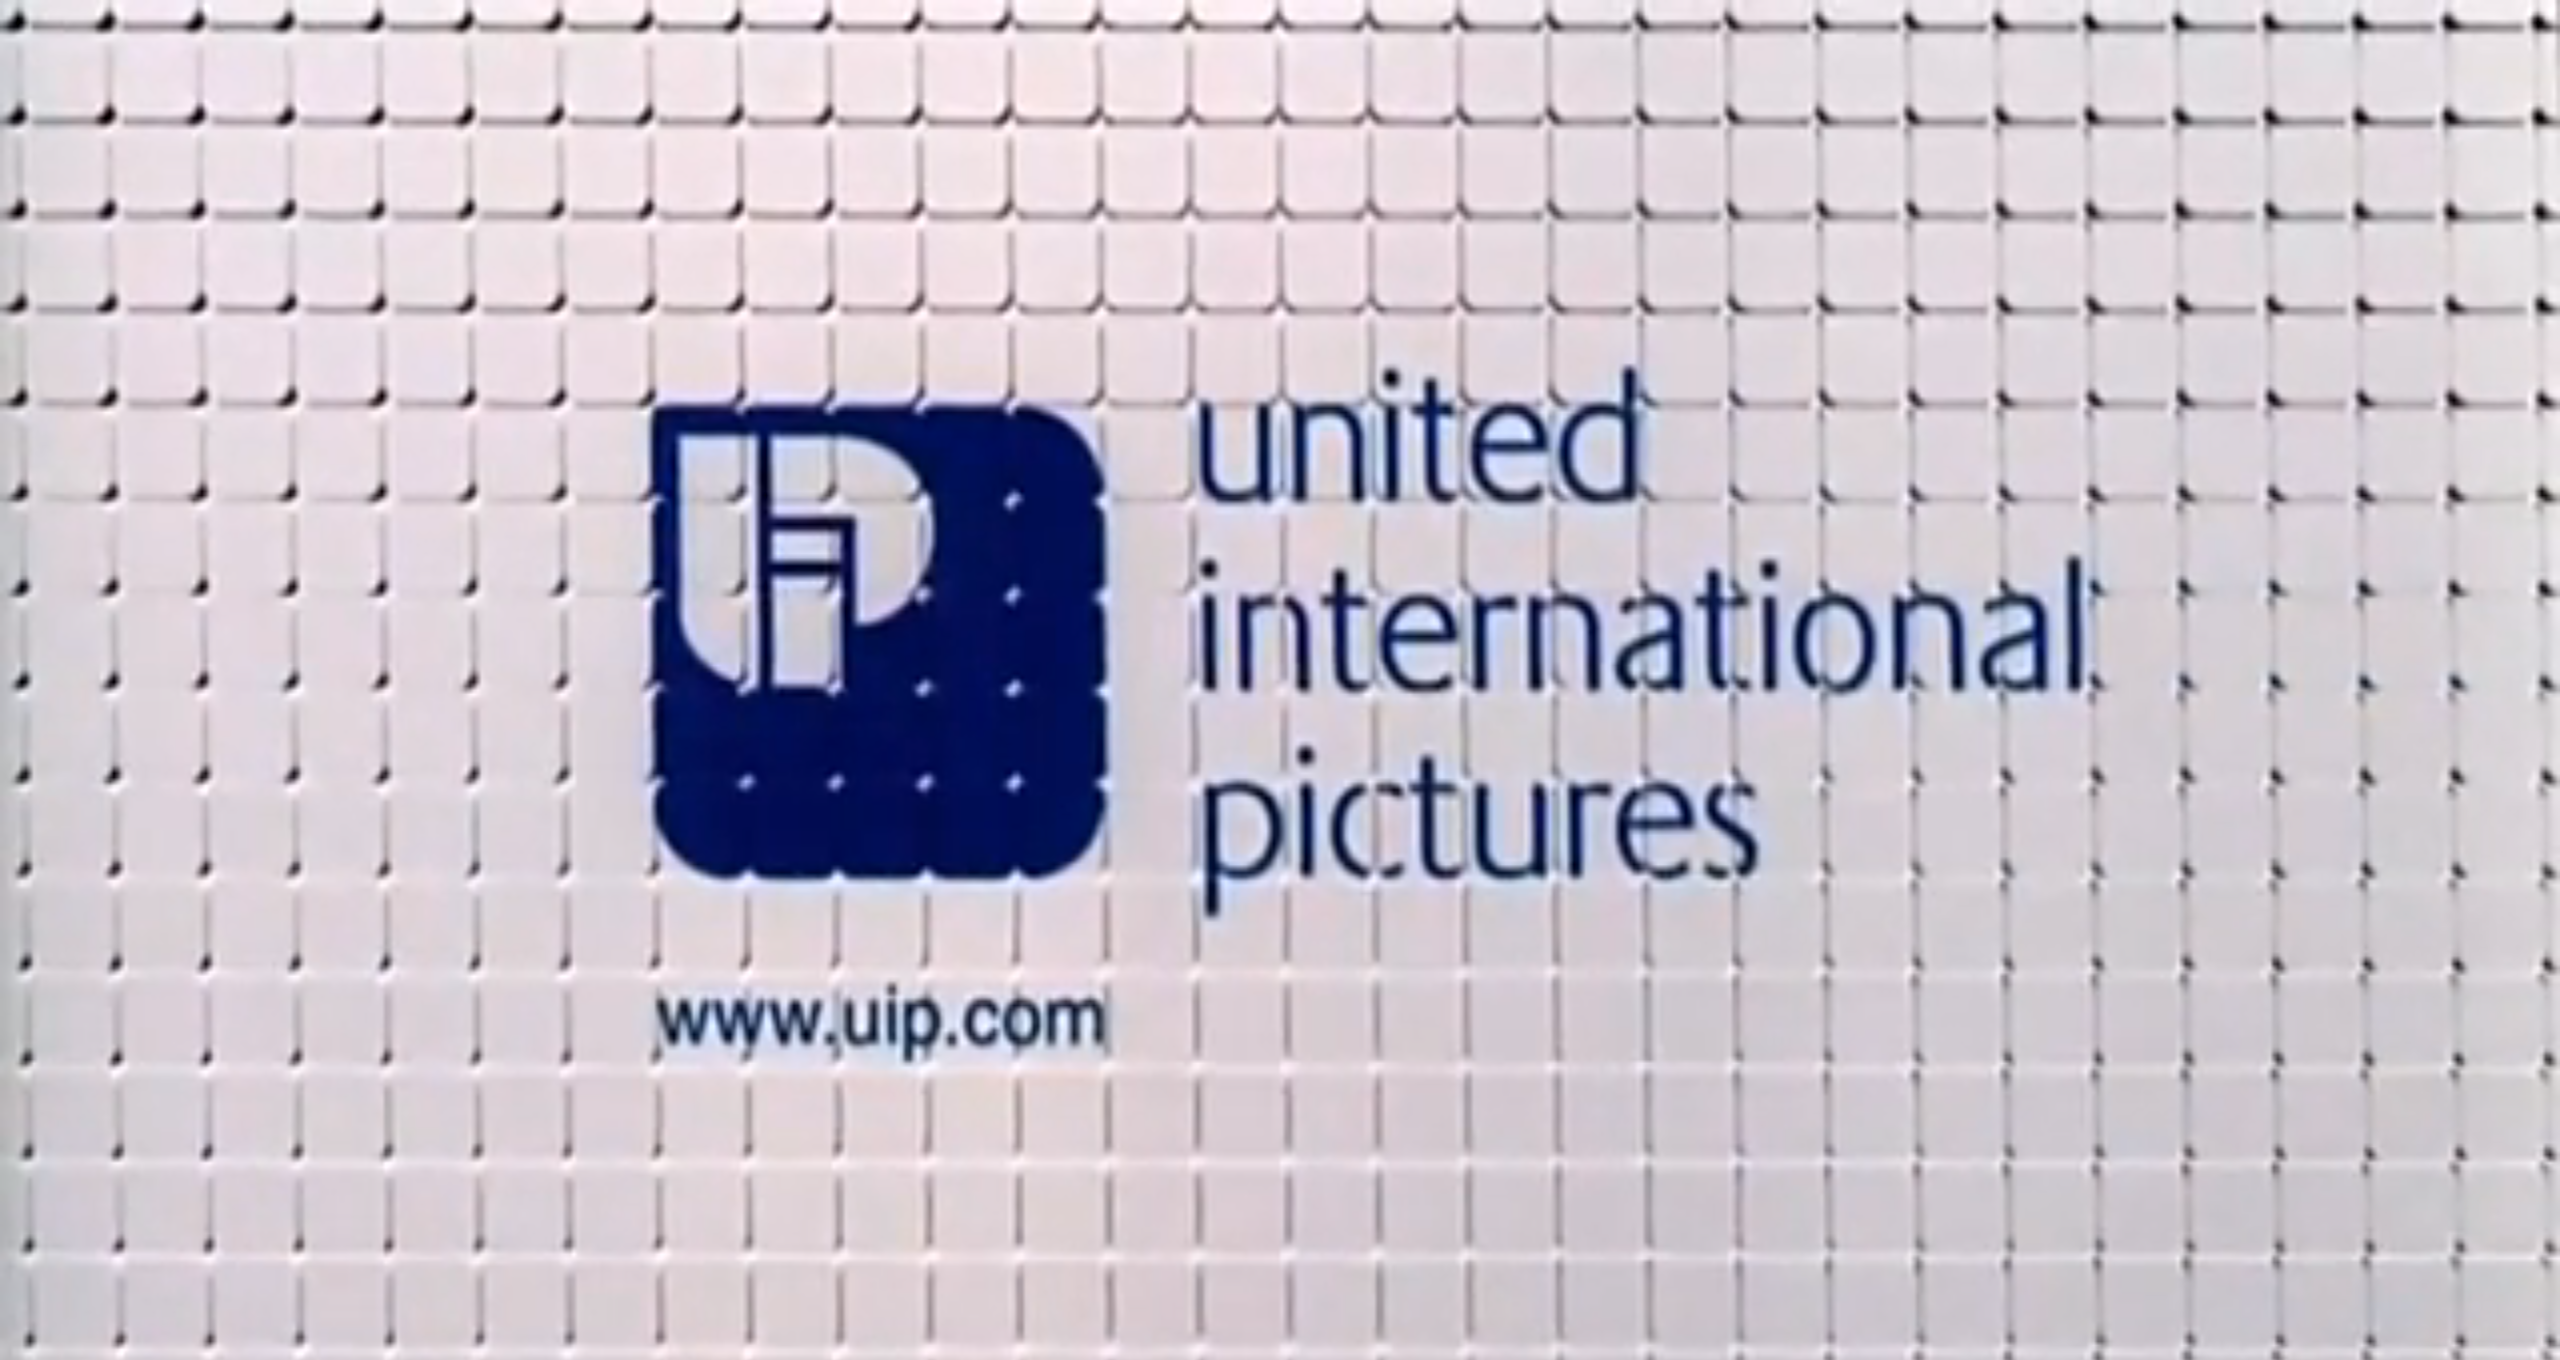 Dieria 1985 logo.png